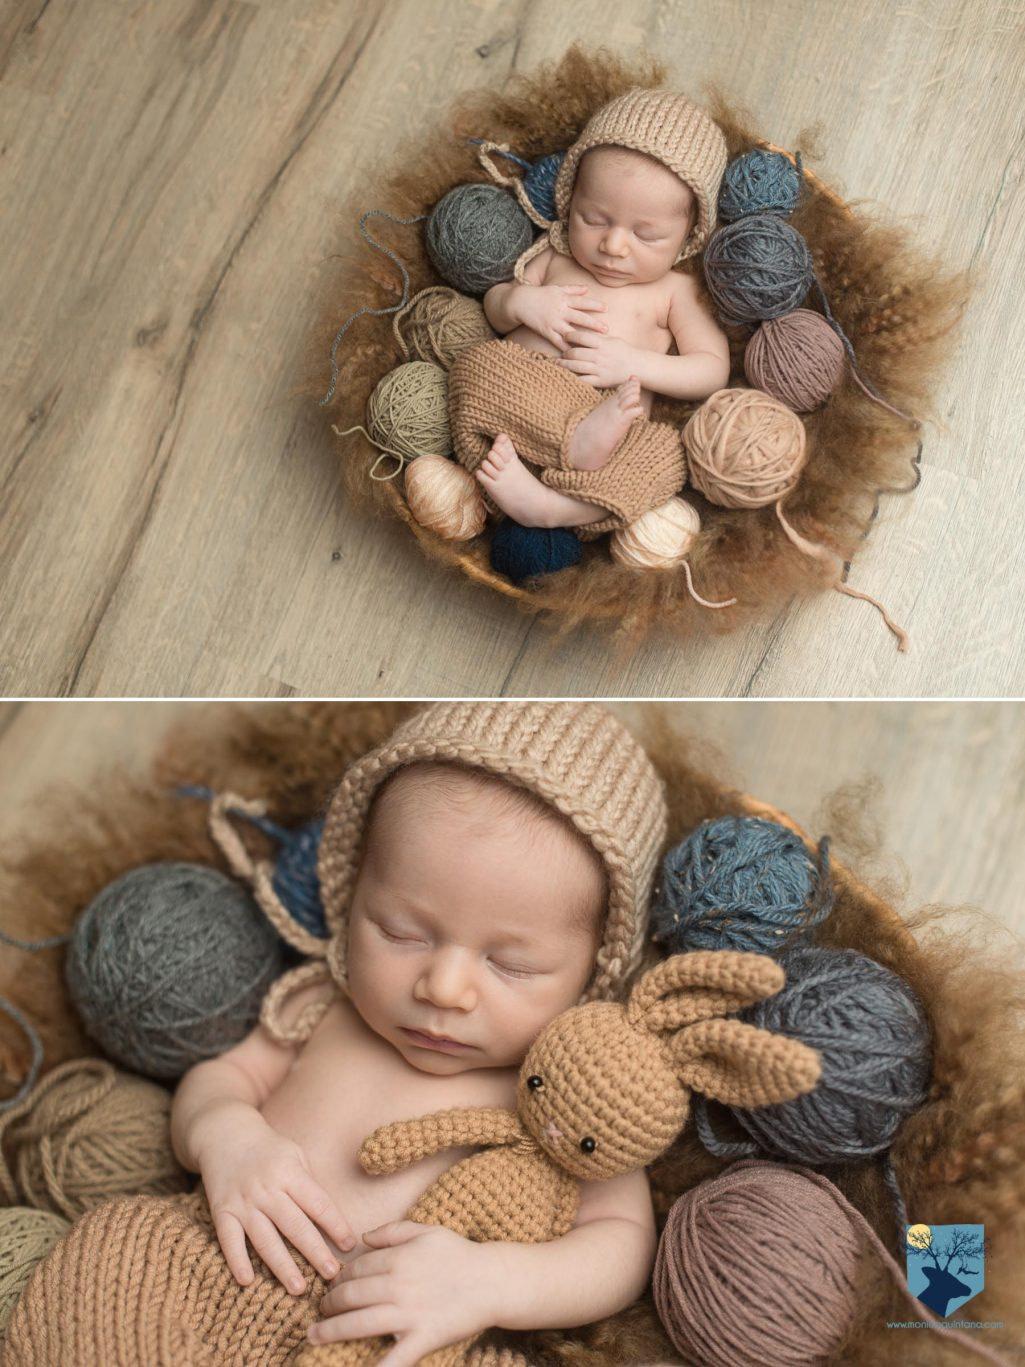 fotografia fotos girona figueres emporda monica quintana bebes niños recien nacido newborn familia retrato